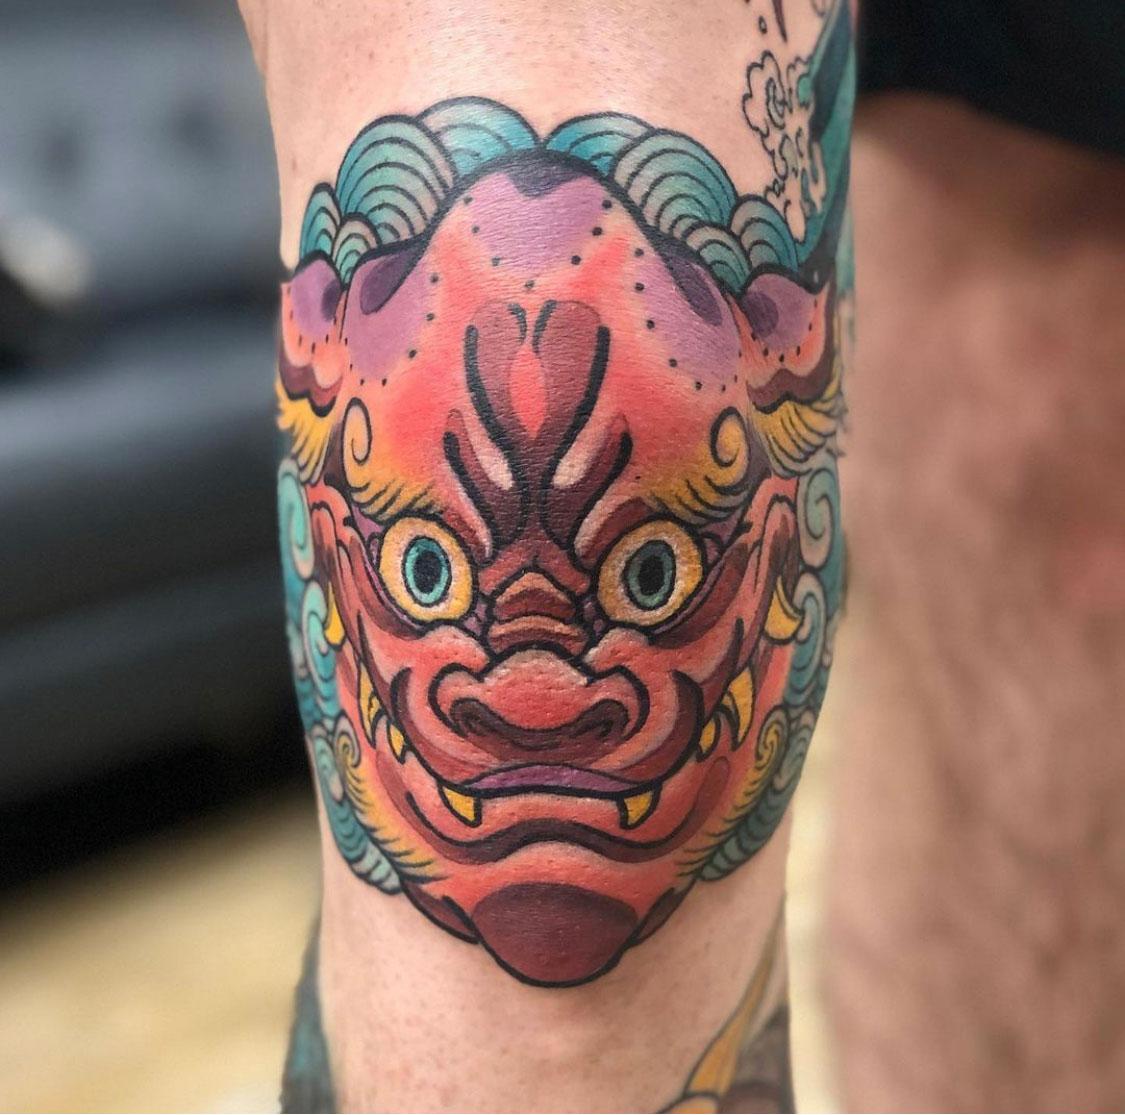 Full colour neo japanese knee tattoo of a karajishi fu dog